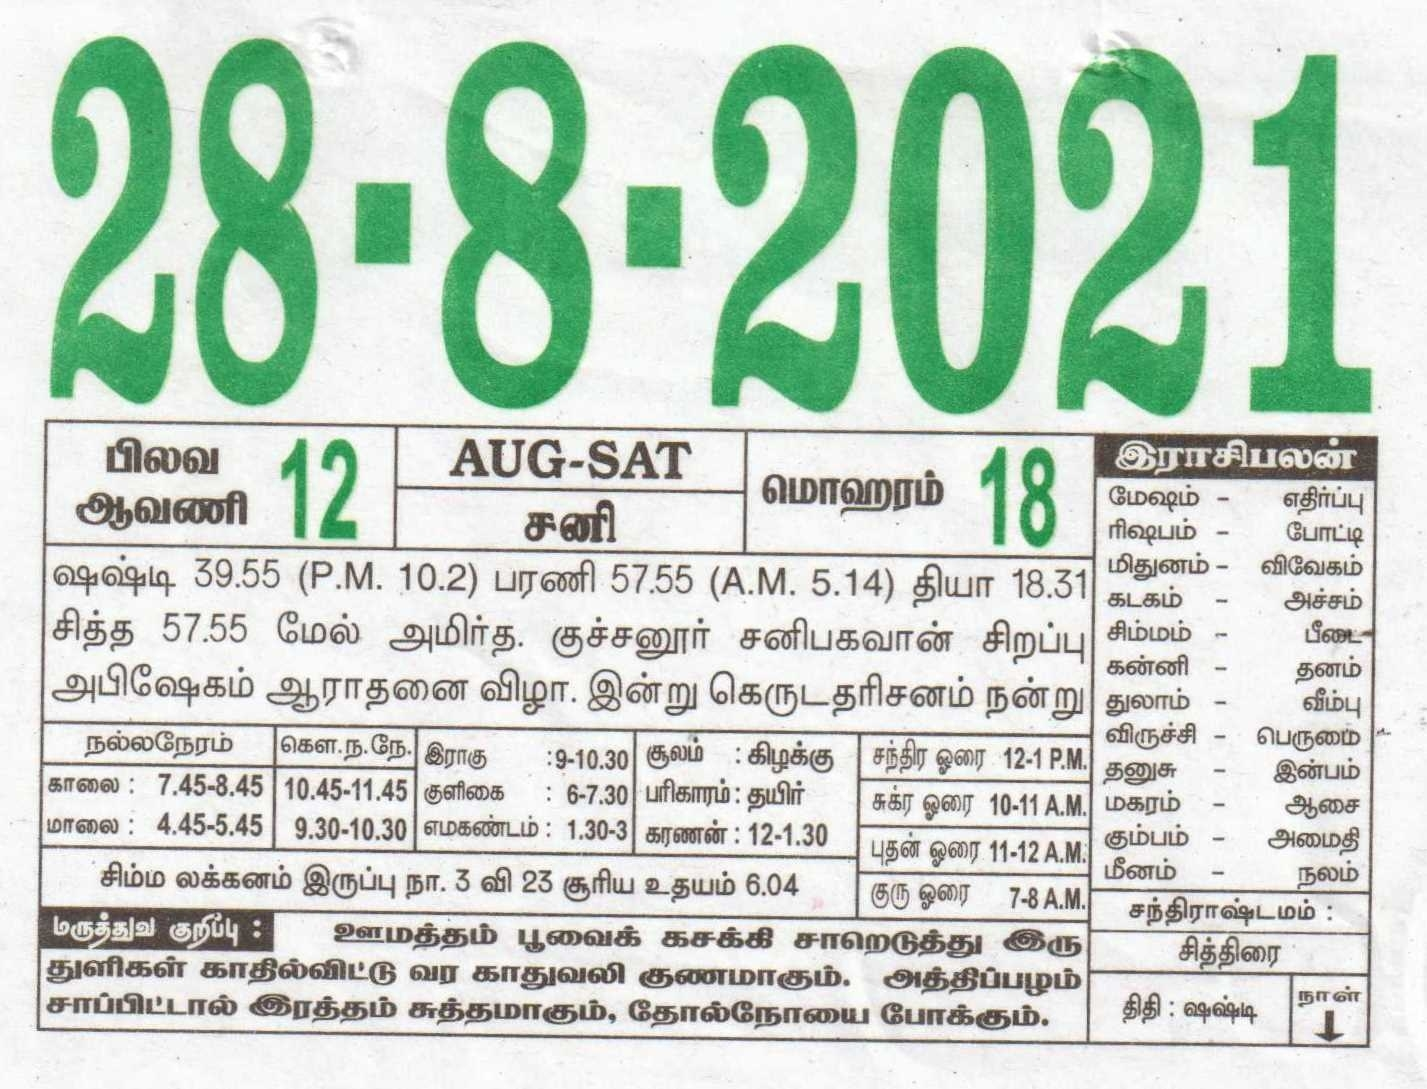 28-08-2021 Daily Calendar | Date 28 , January Daily Tear Off Calendar | Daily Panchangam Rasi Palan June 2021 Tamil Daily Calendar